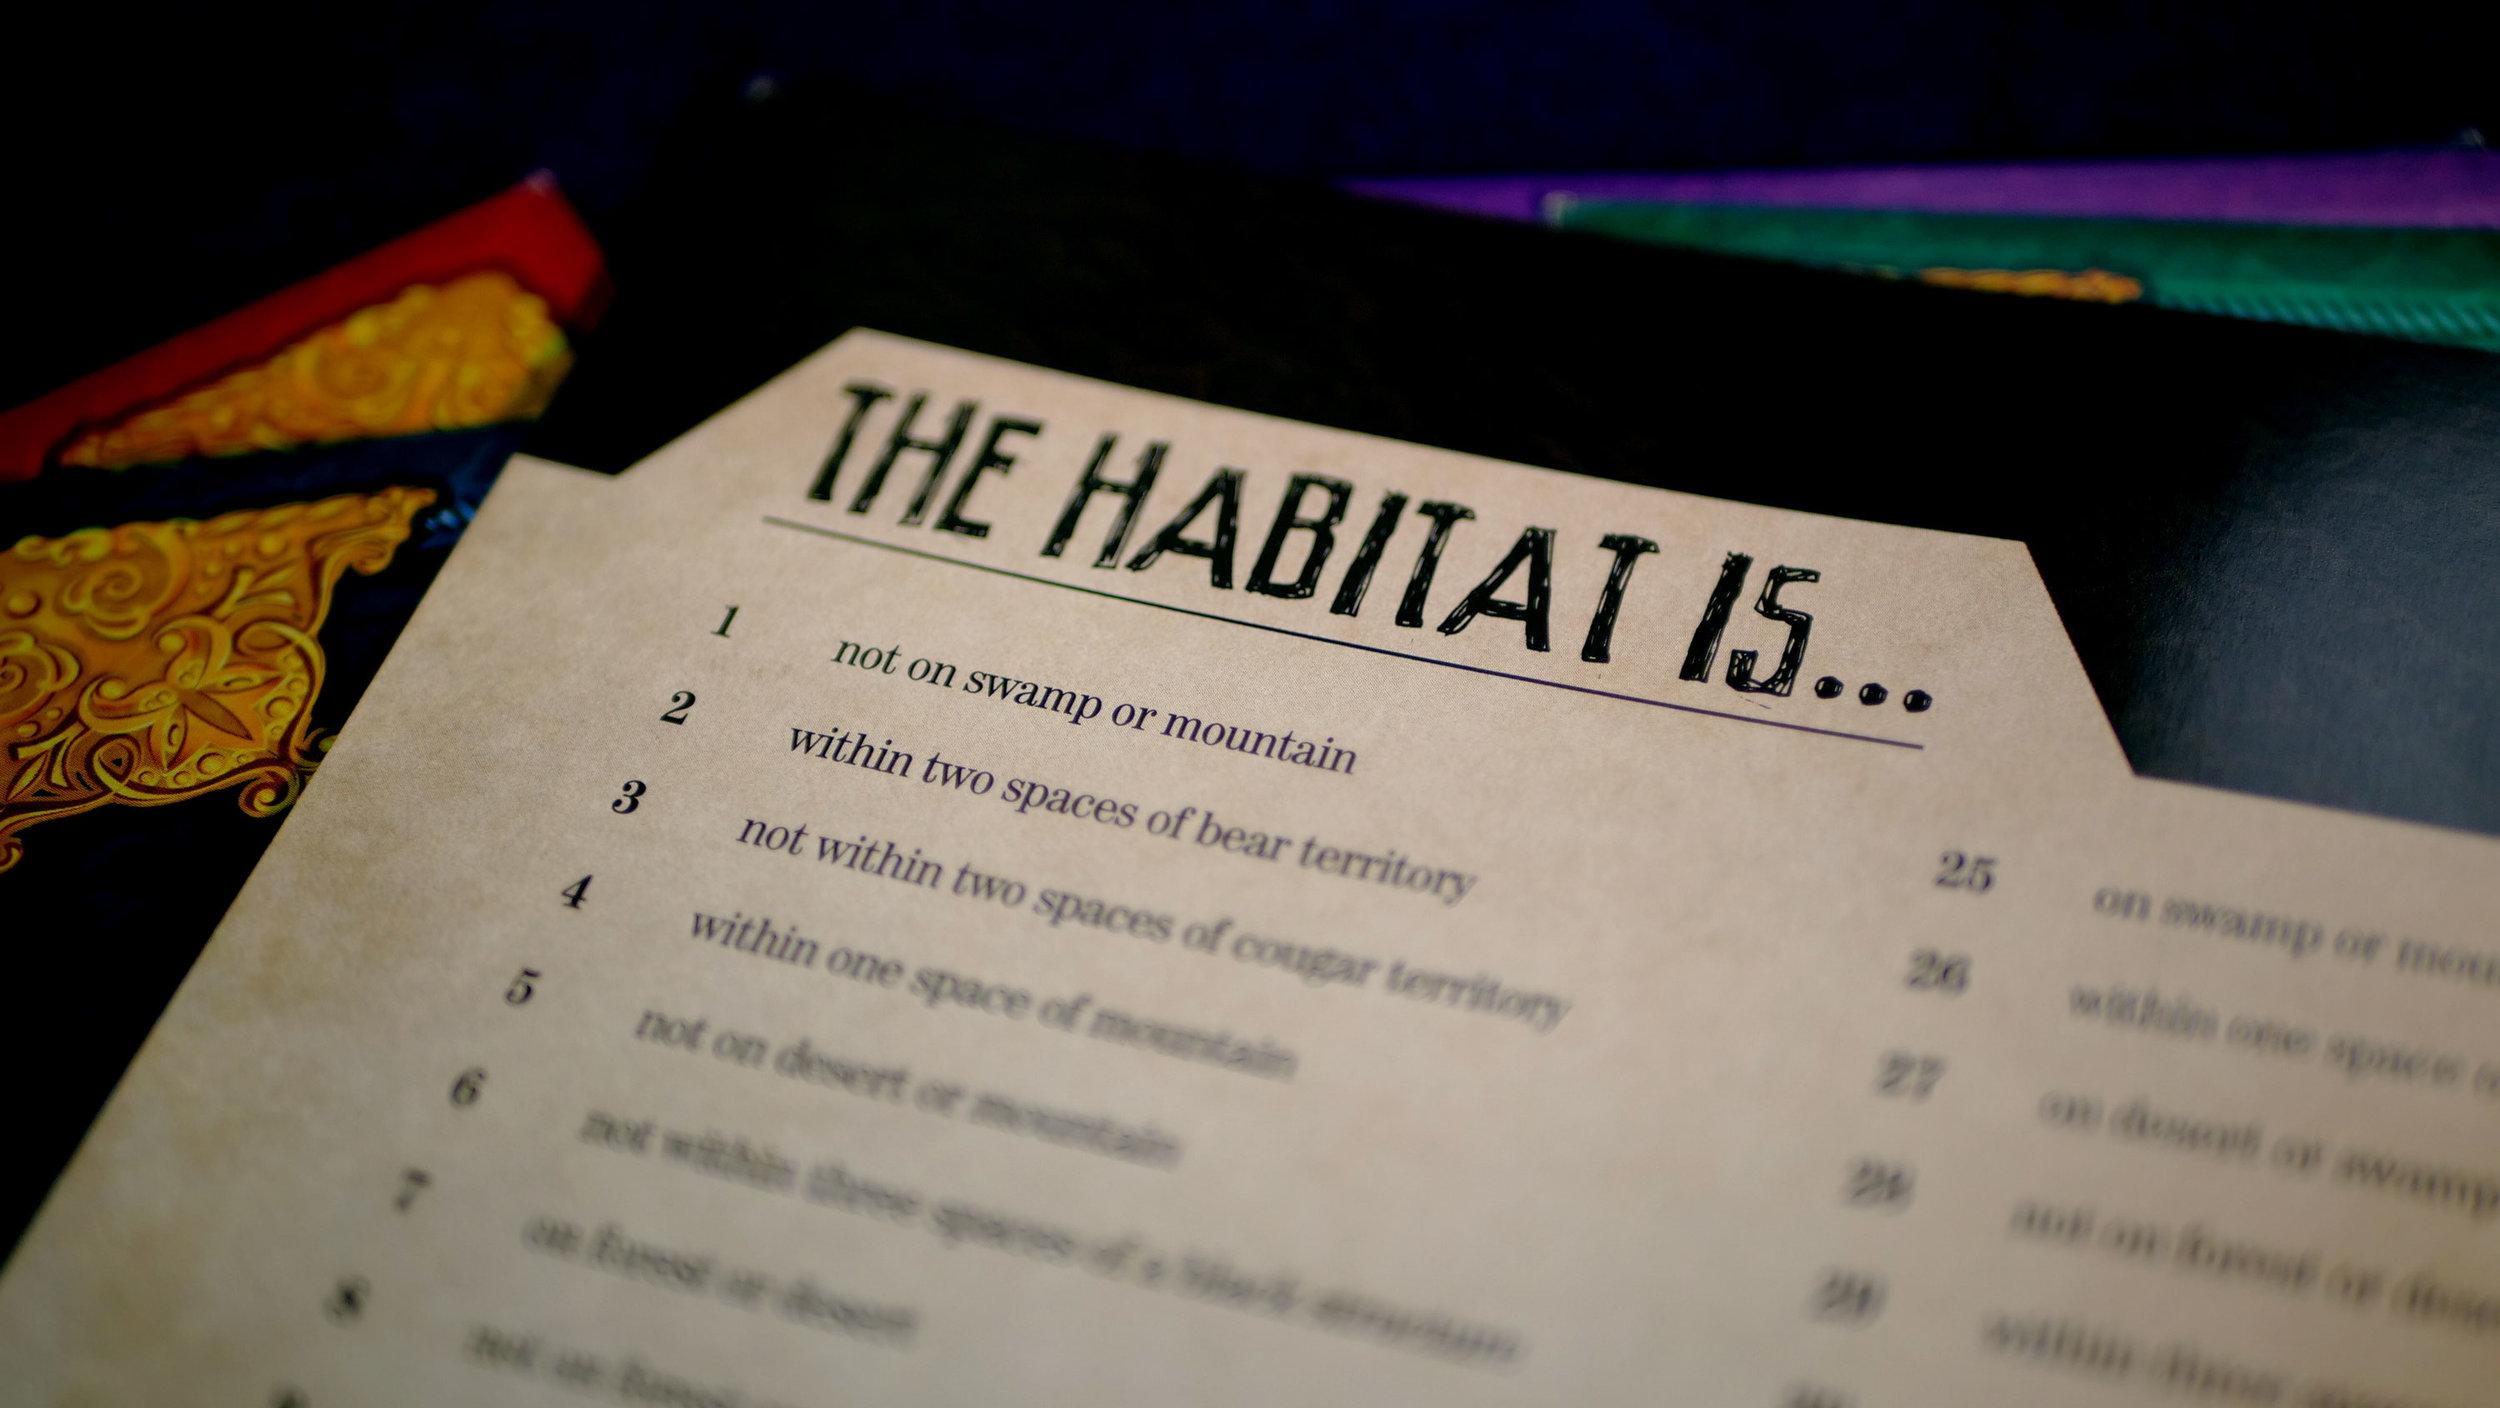 Habitat_Cryptid.jpg